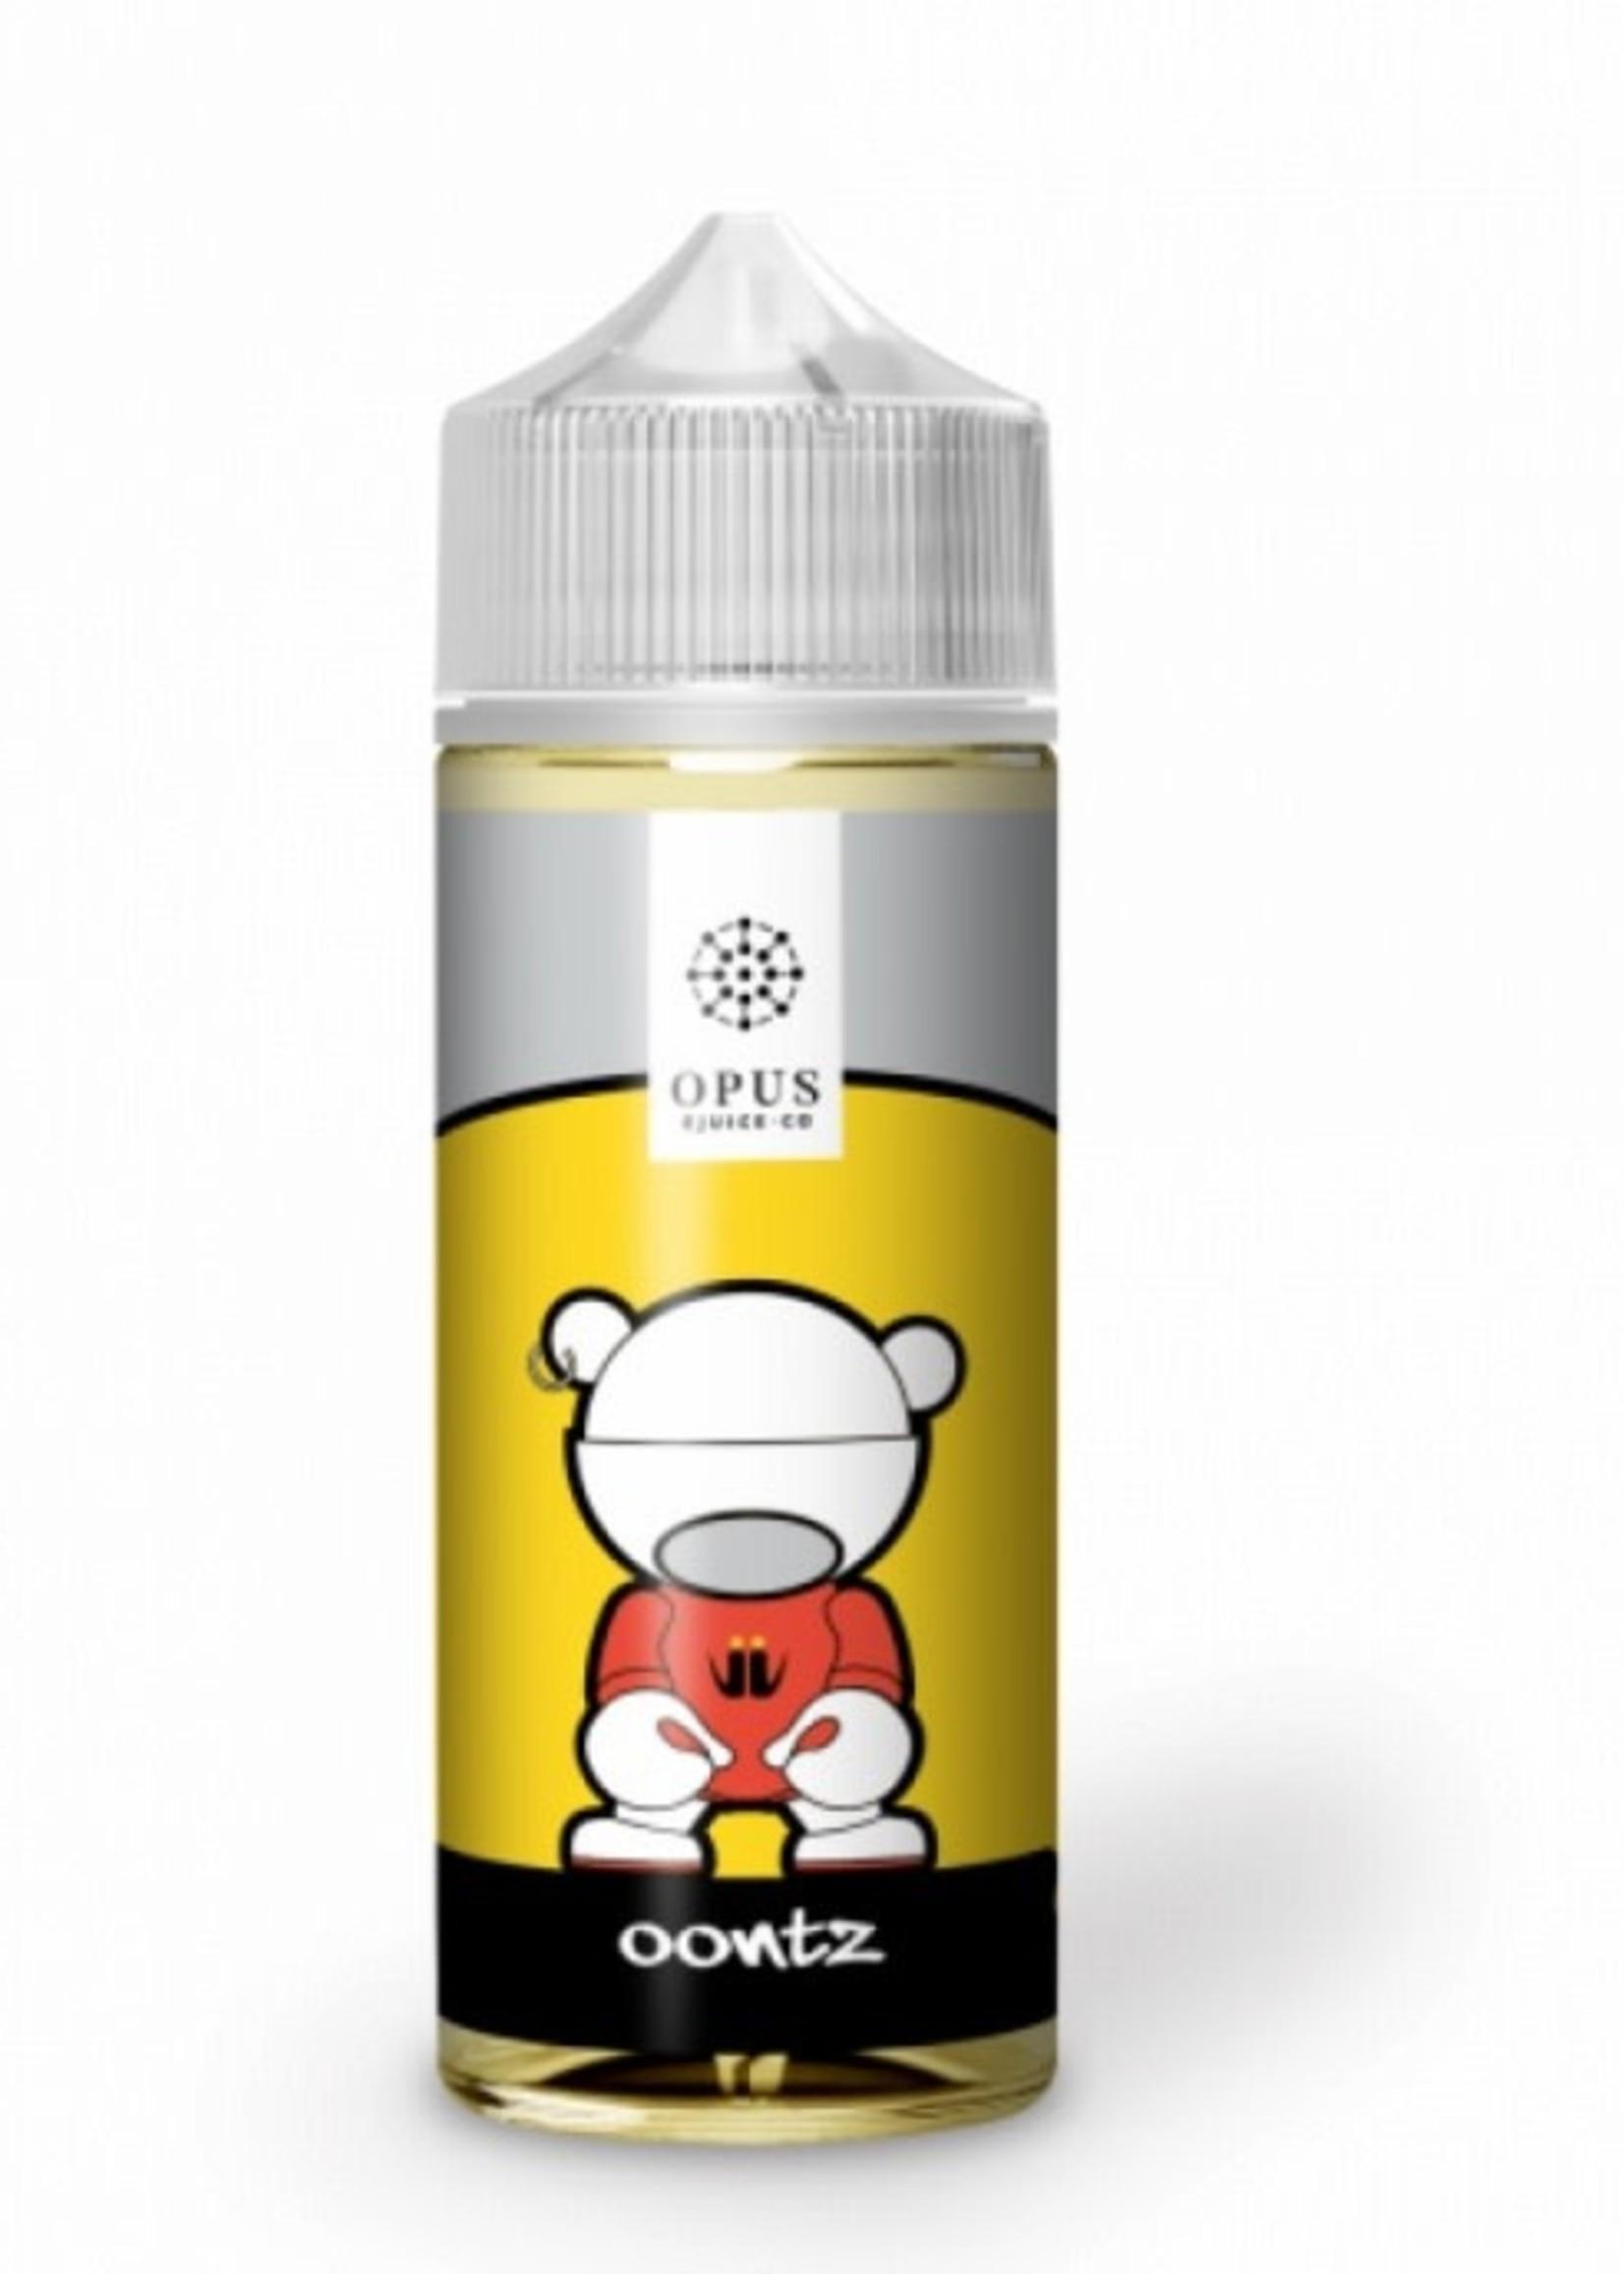 Opus Vape flavour - Oontz 120ml- 3mg